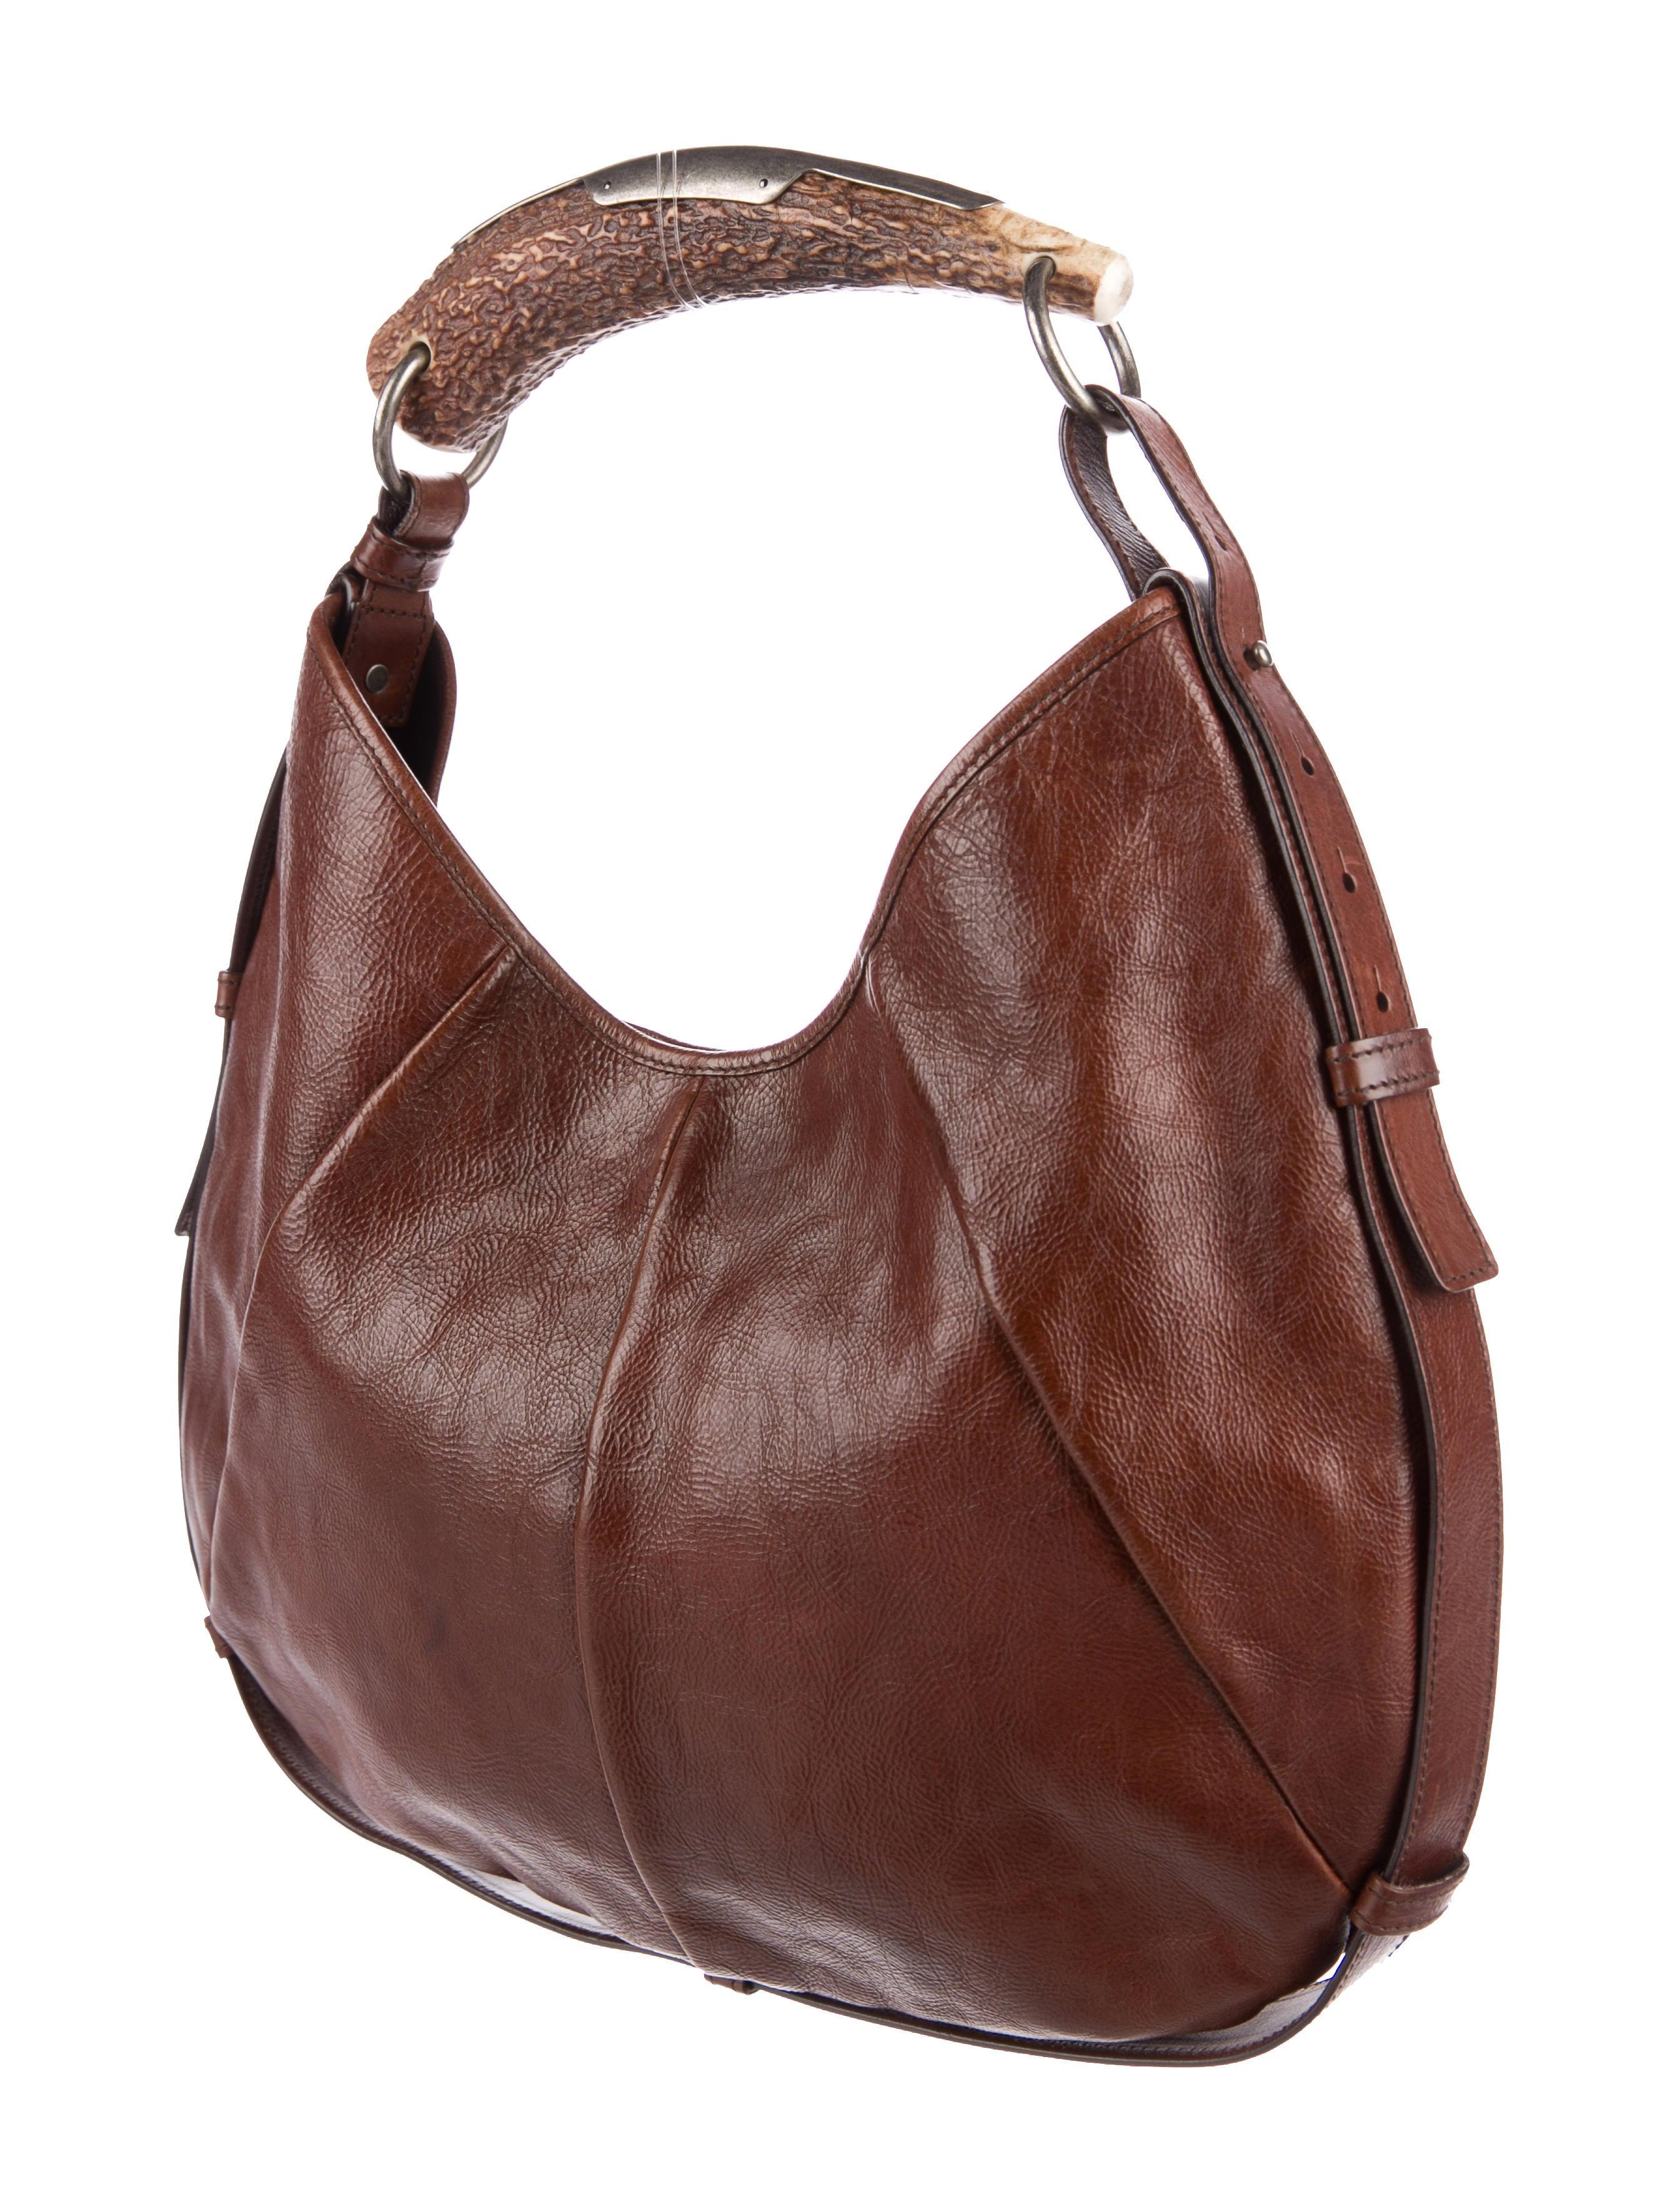 Yves Saint Laurent Leather Mombasa Bag Handbags